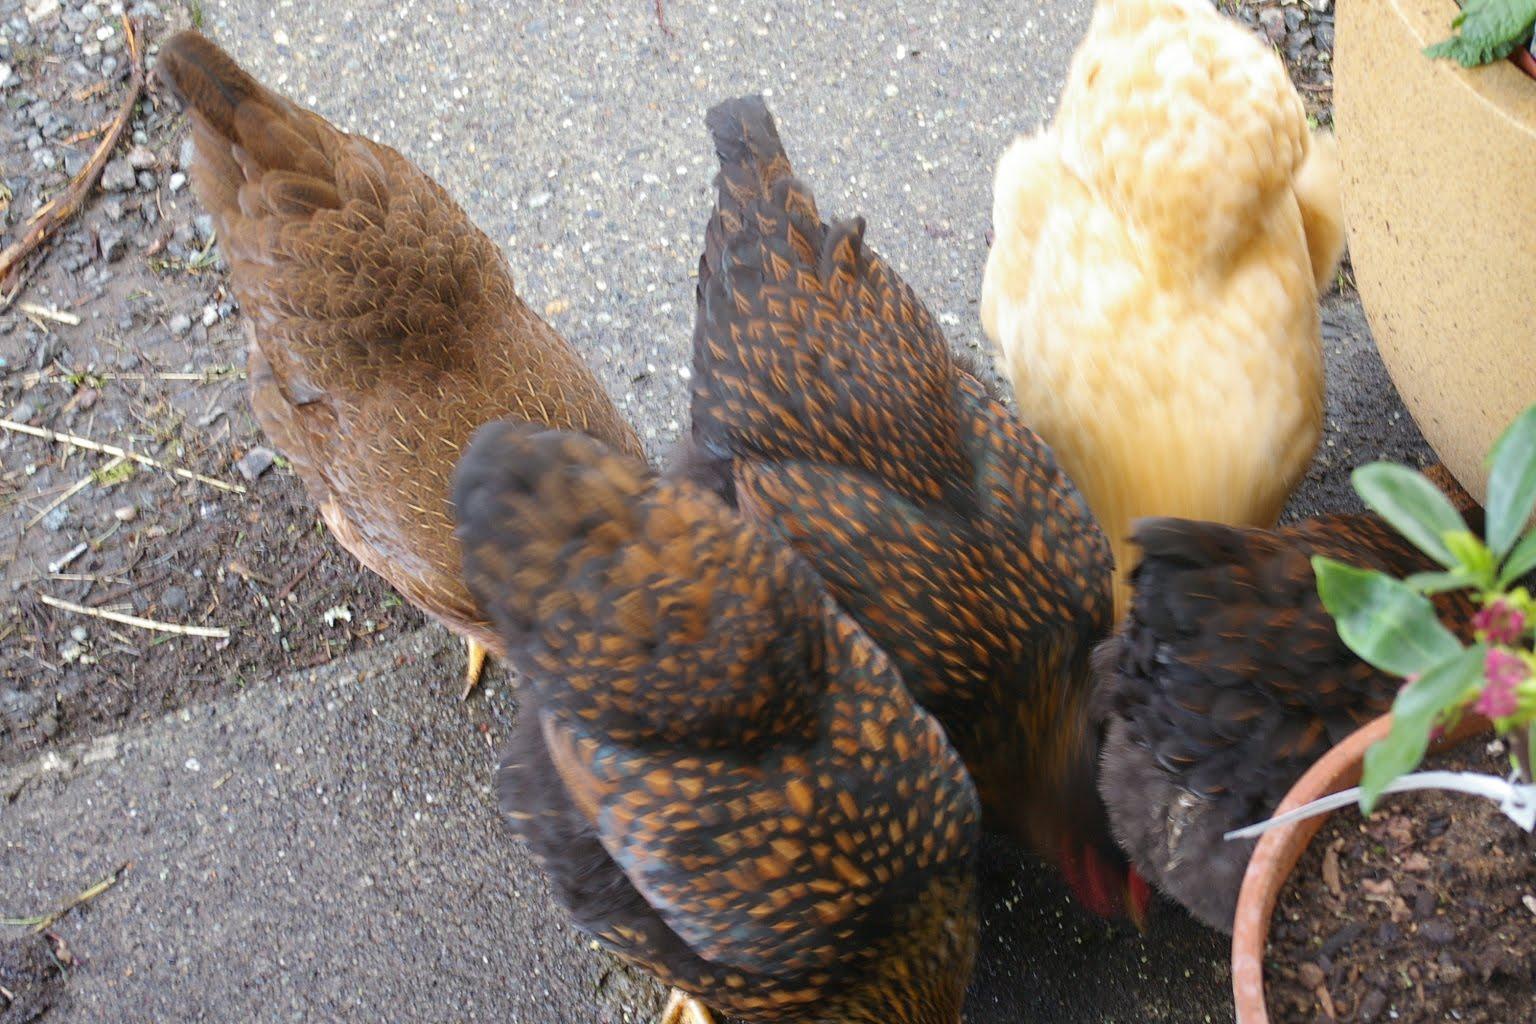 Chicks Shoe Store Mercer Island